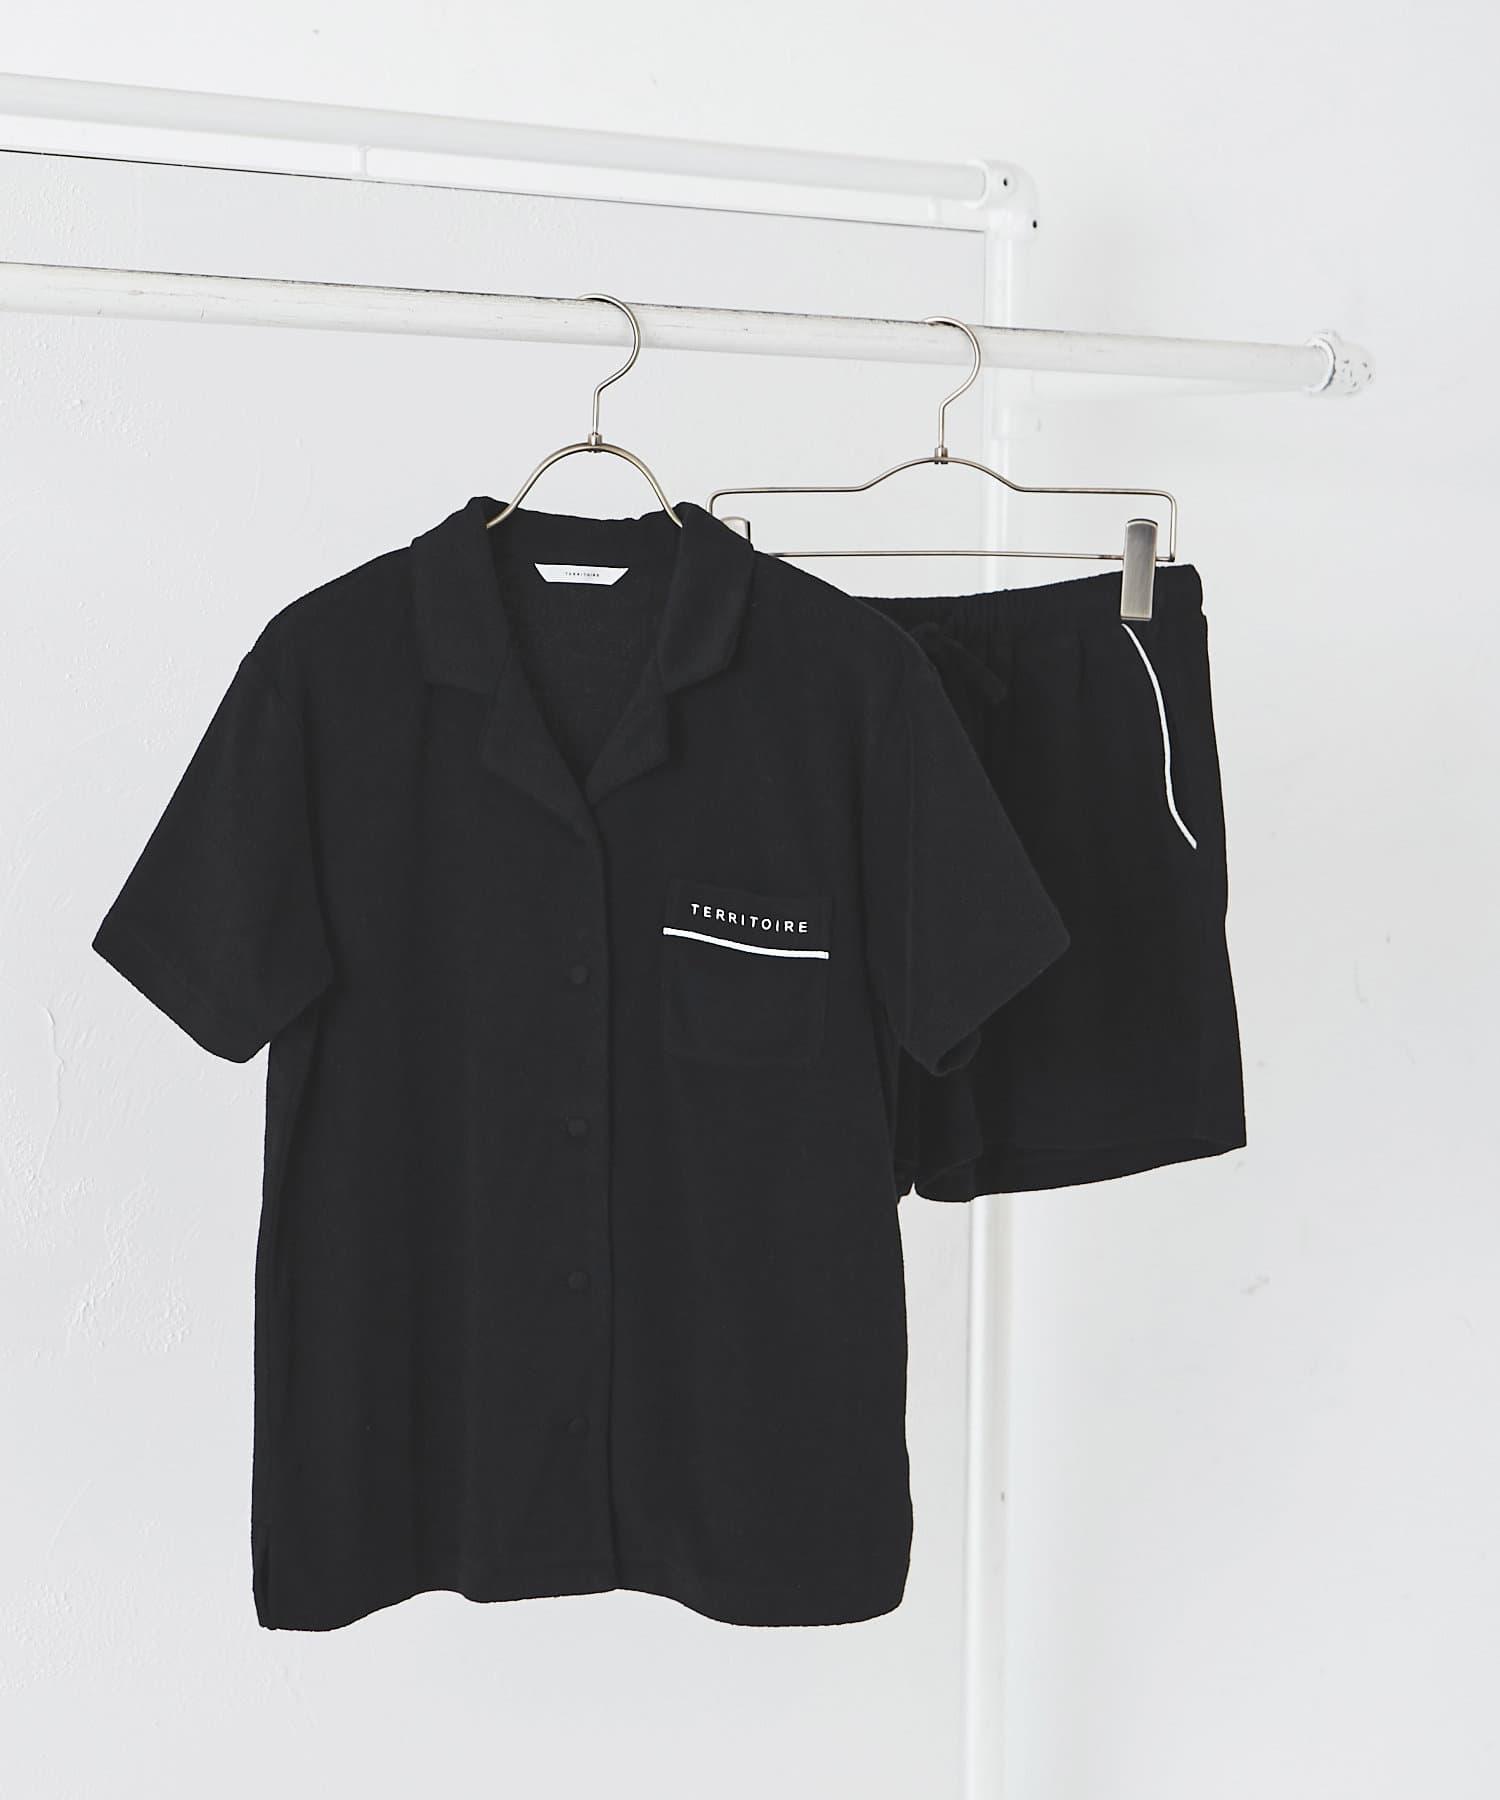 TERRITOIRE(テリトワール) コットンパイルパジャマ 上下セット